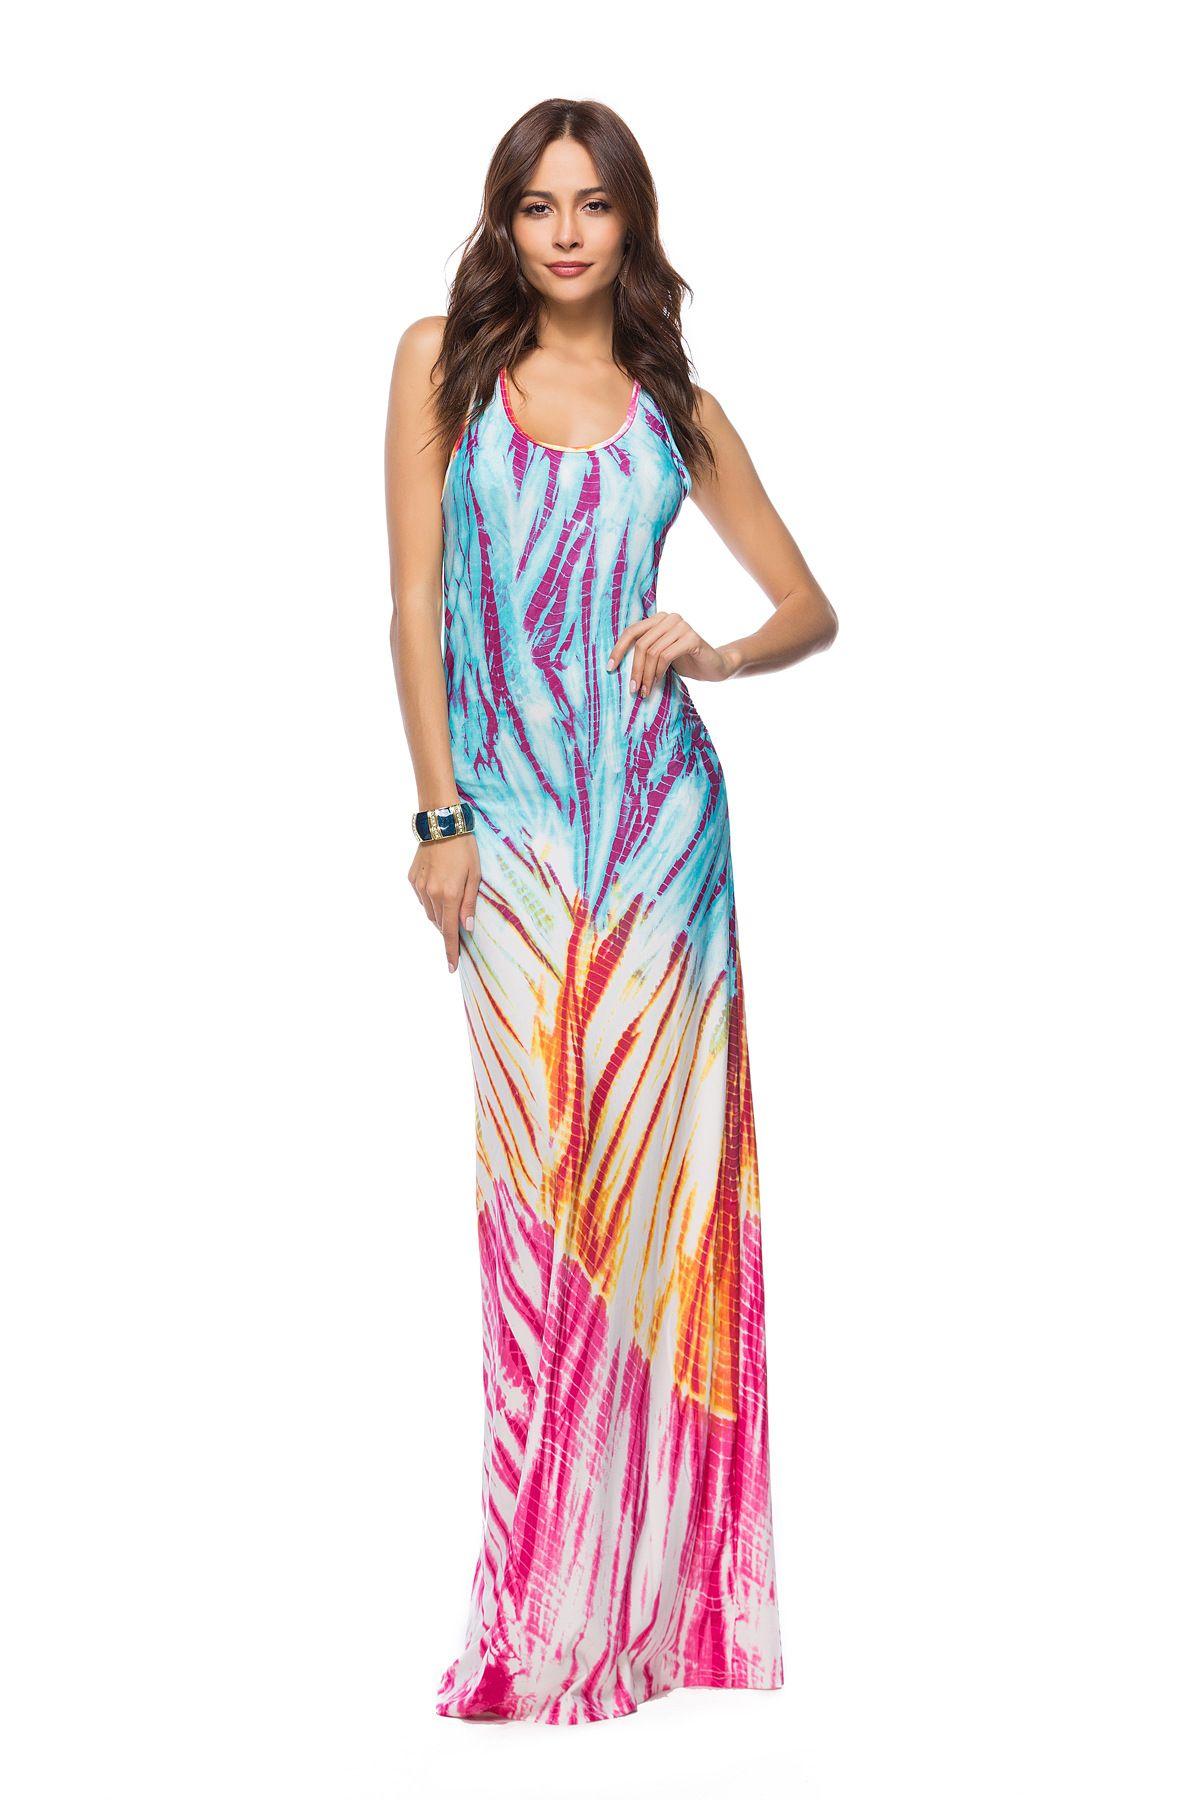 b1f6e1f38d7 Plus Size Formal Dresses Online India